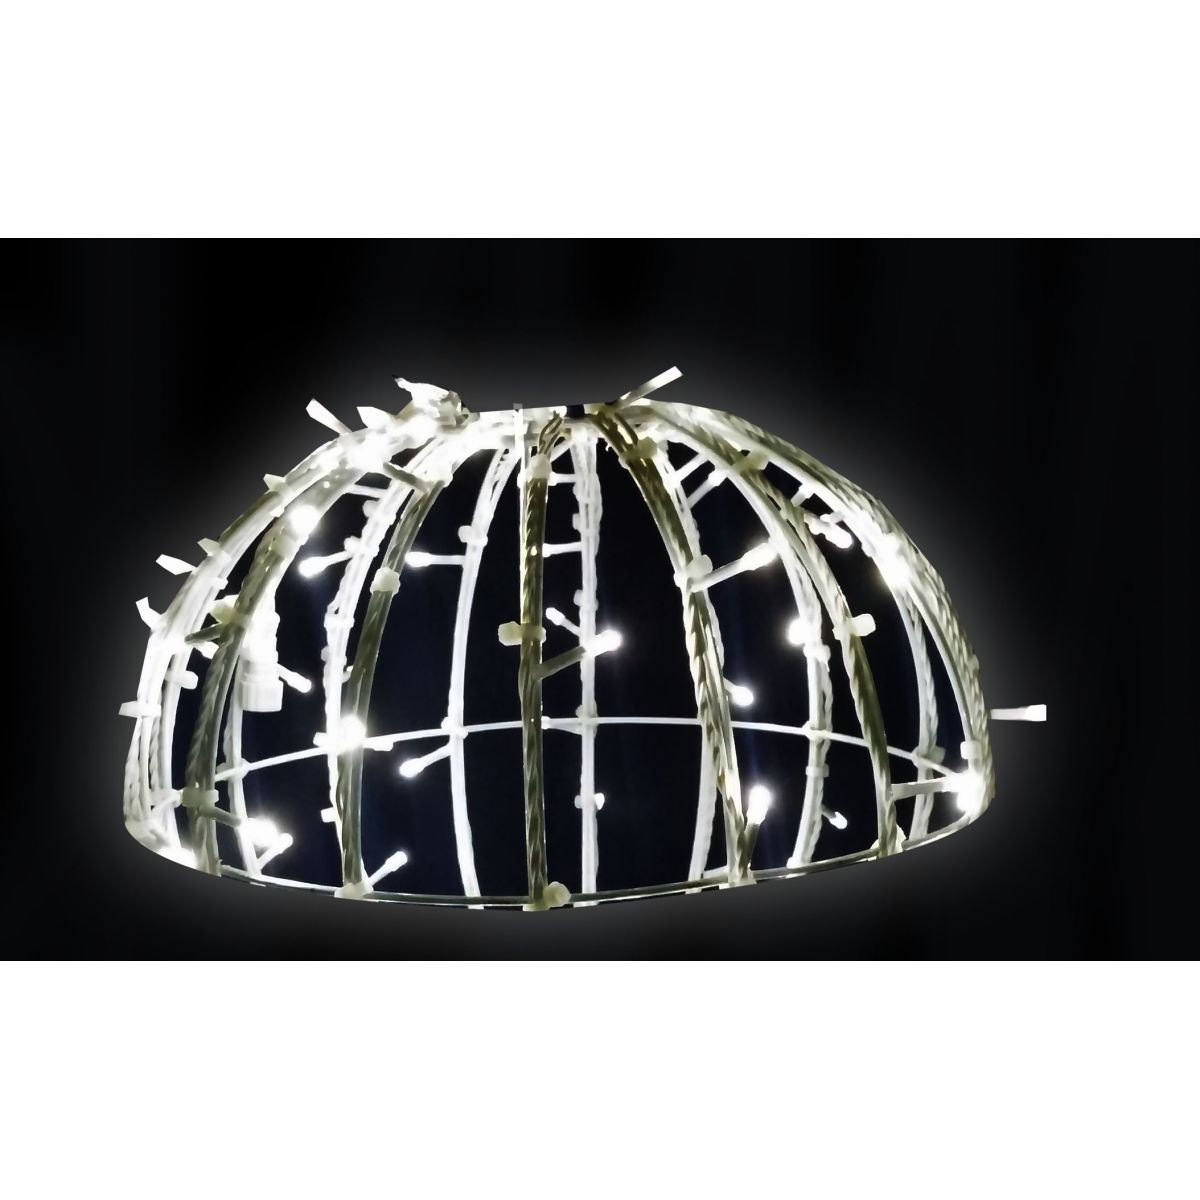 FI-132/100 - Bola de Natal 1,00 Metro Meia Face  Esfera Gigante Led 3D